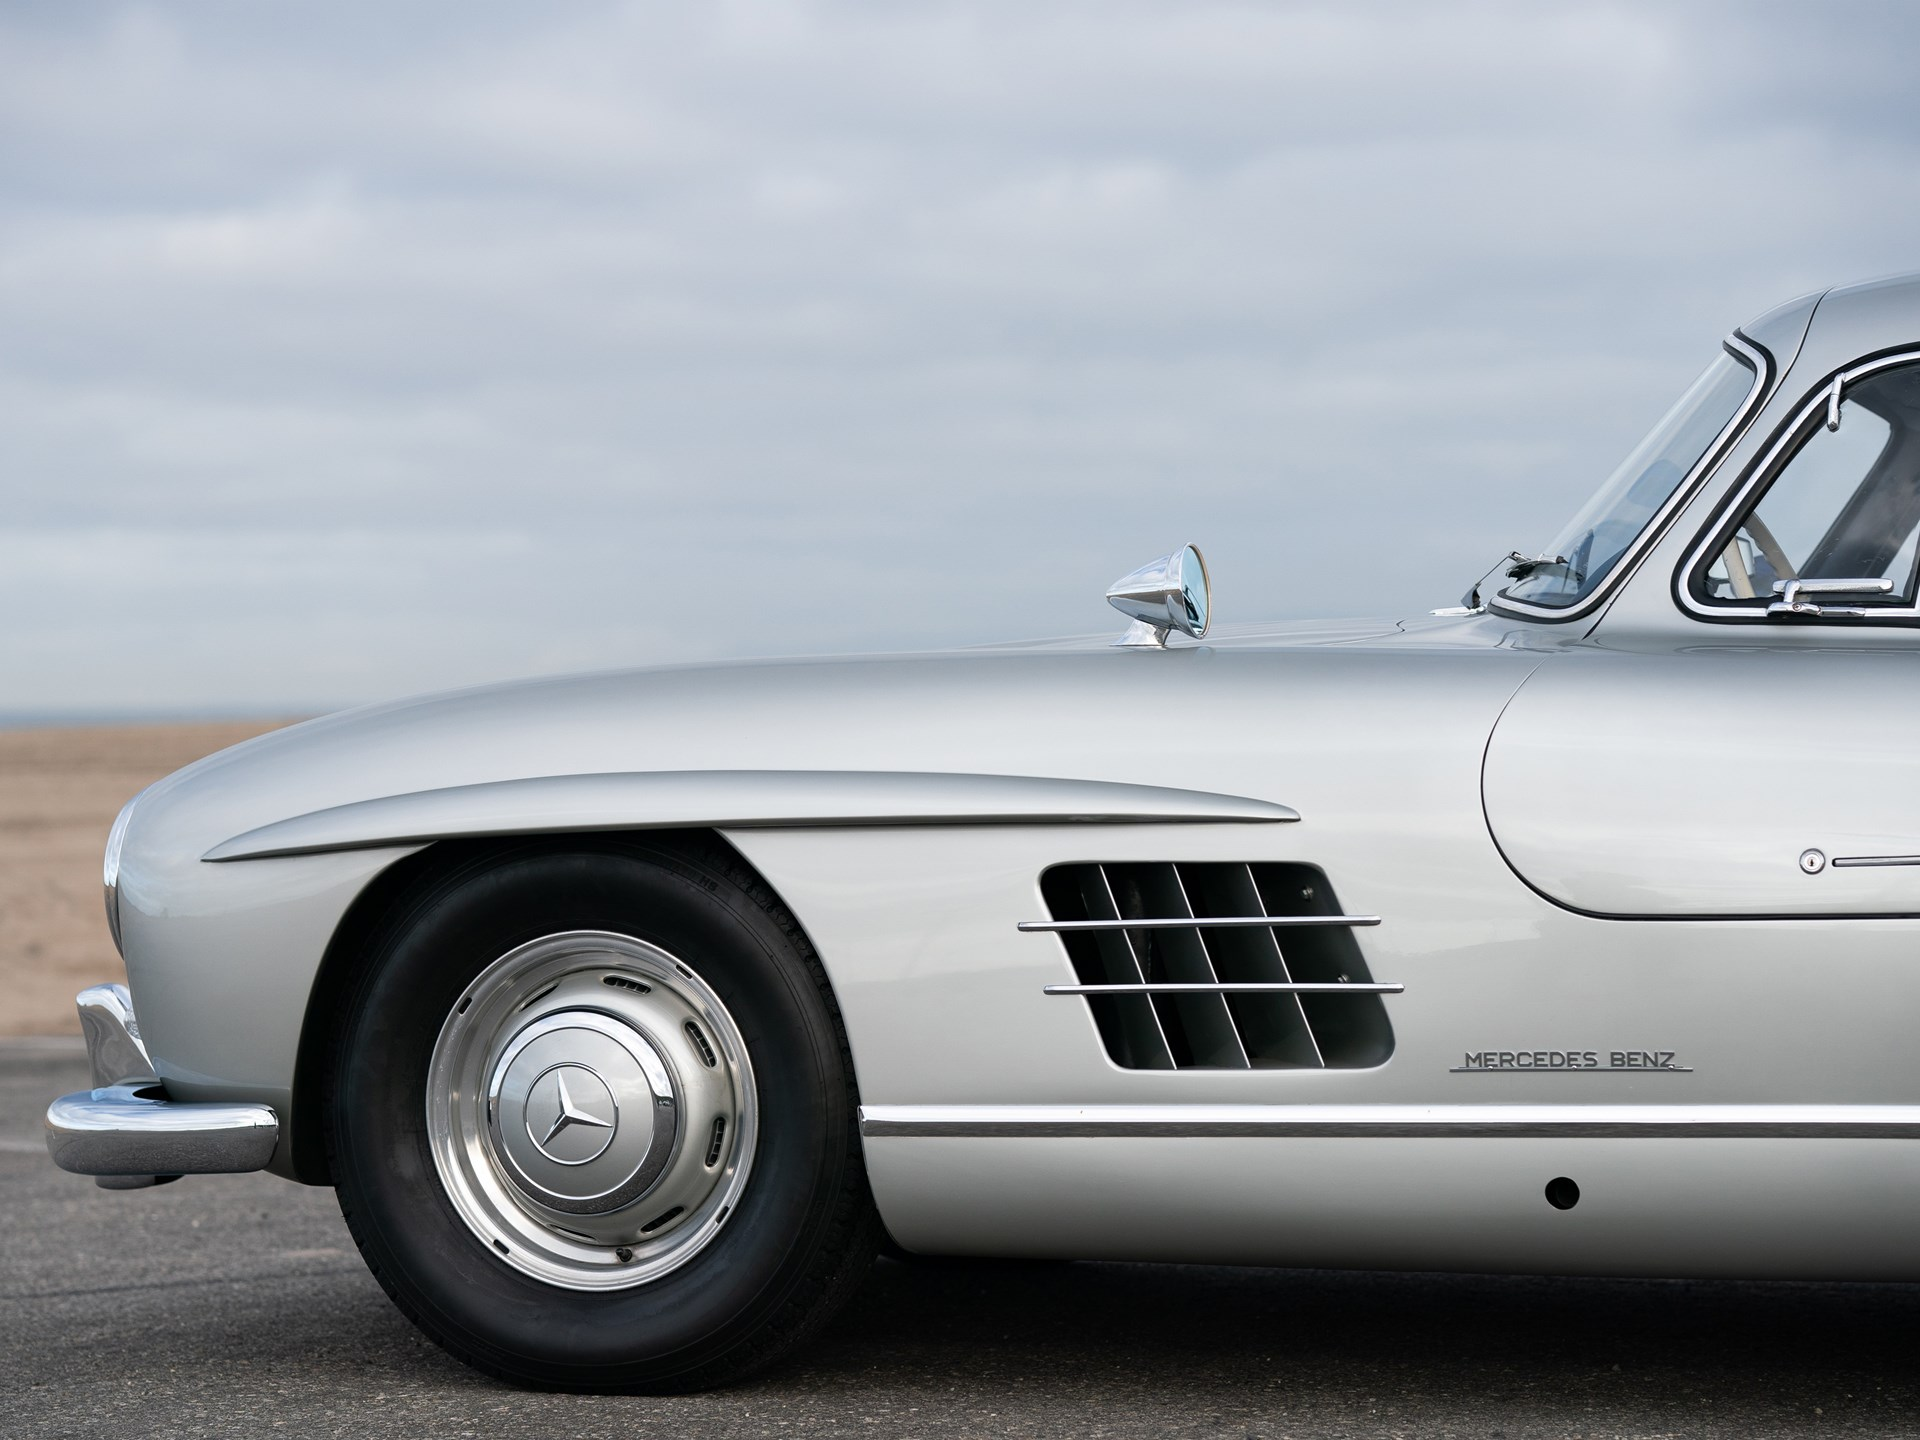 RM Sotheby's - 1955 Mercedes-Benz 300 SL Gullwing | Fort Lauderdale 2019